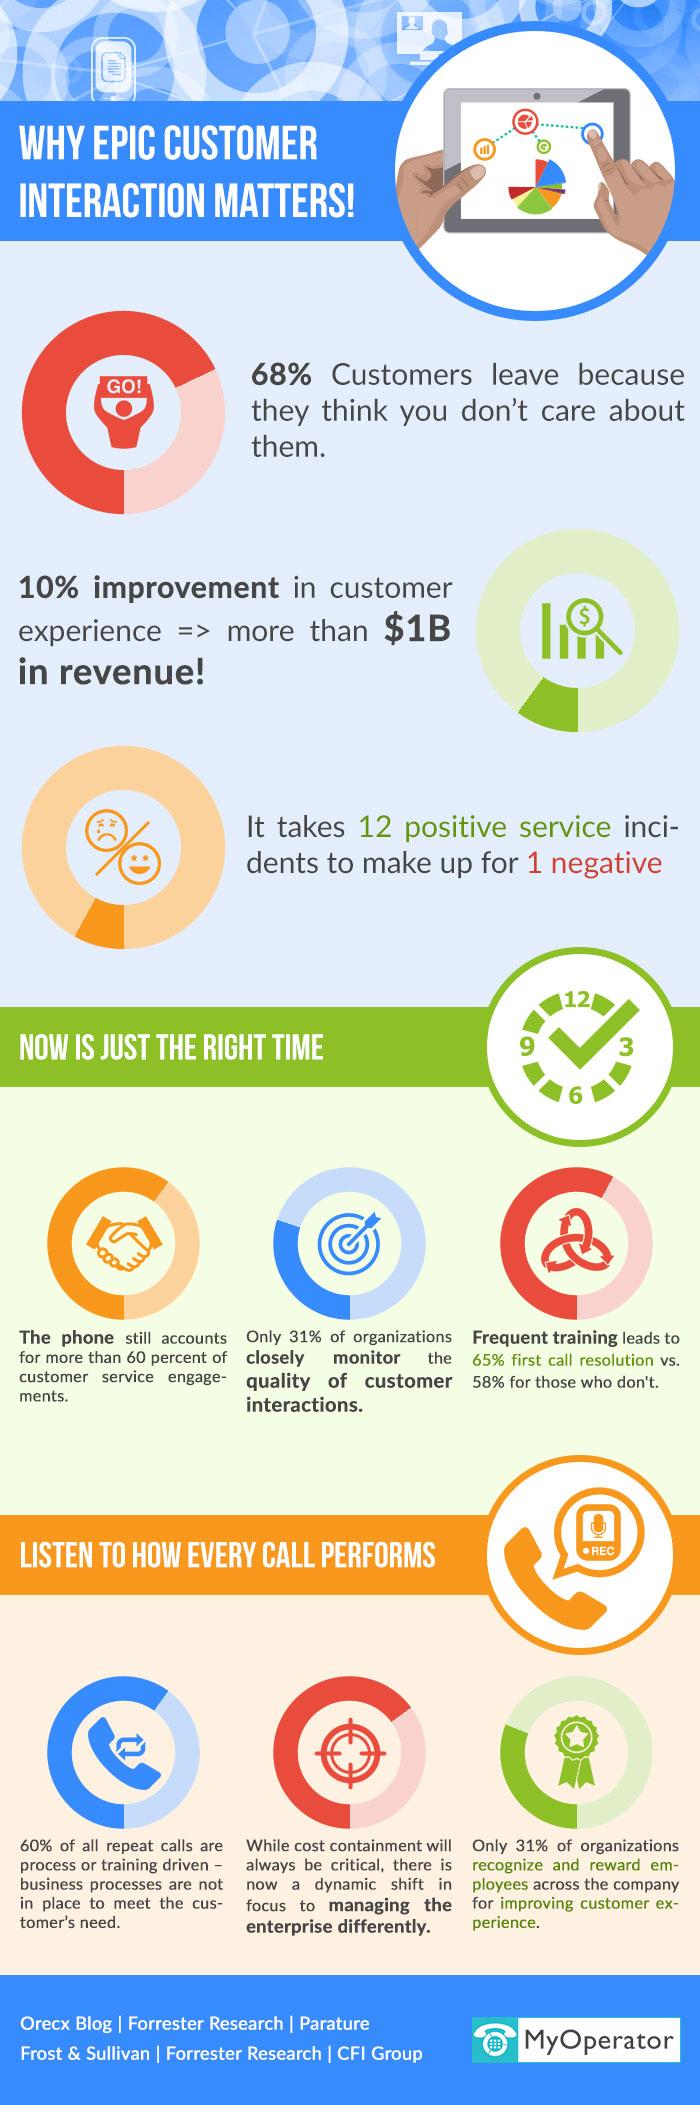 Customer interaction matters